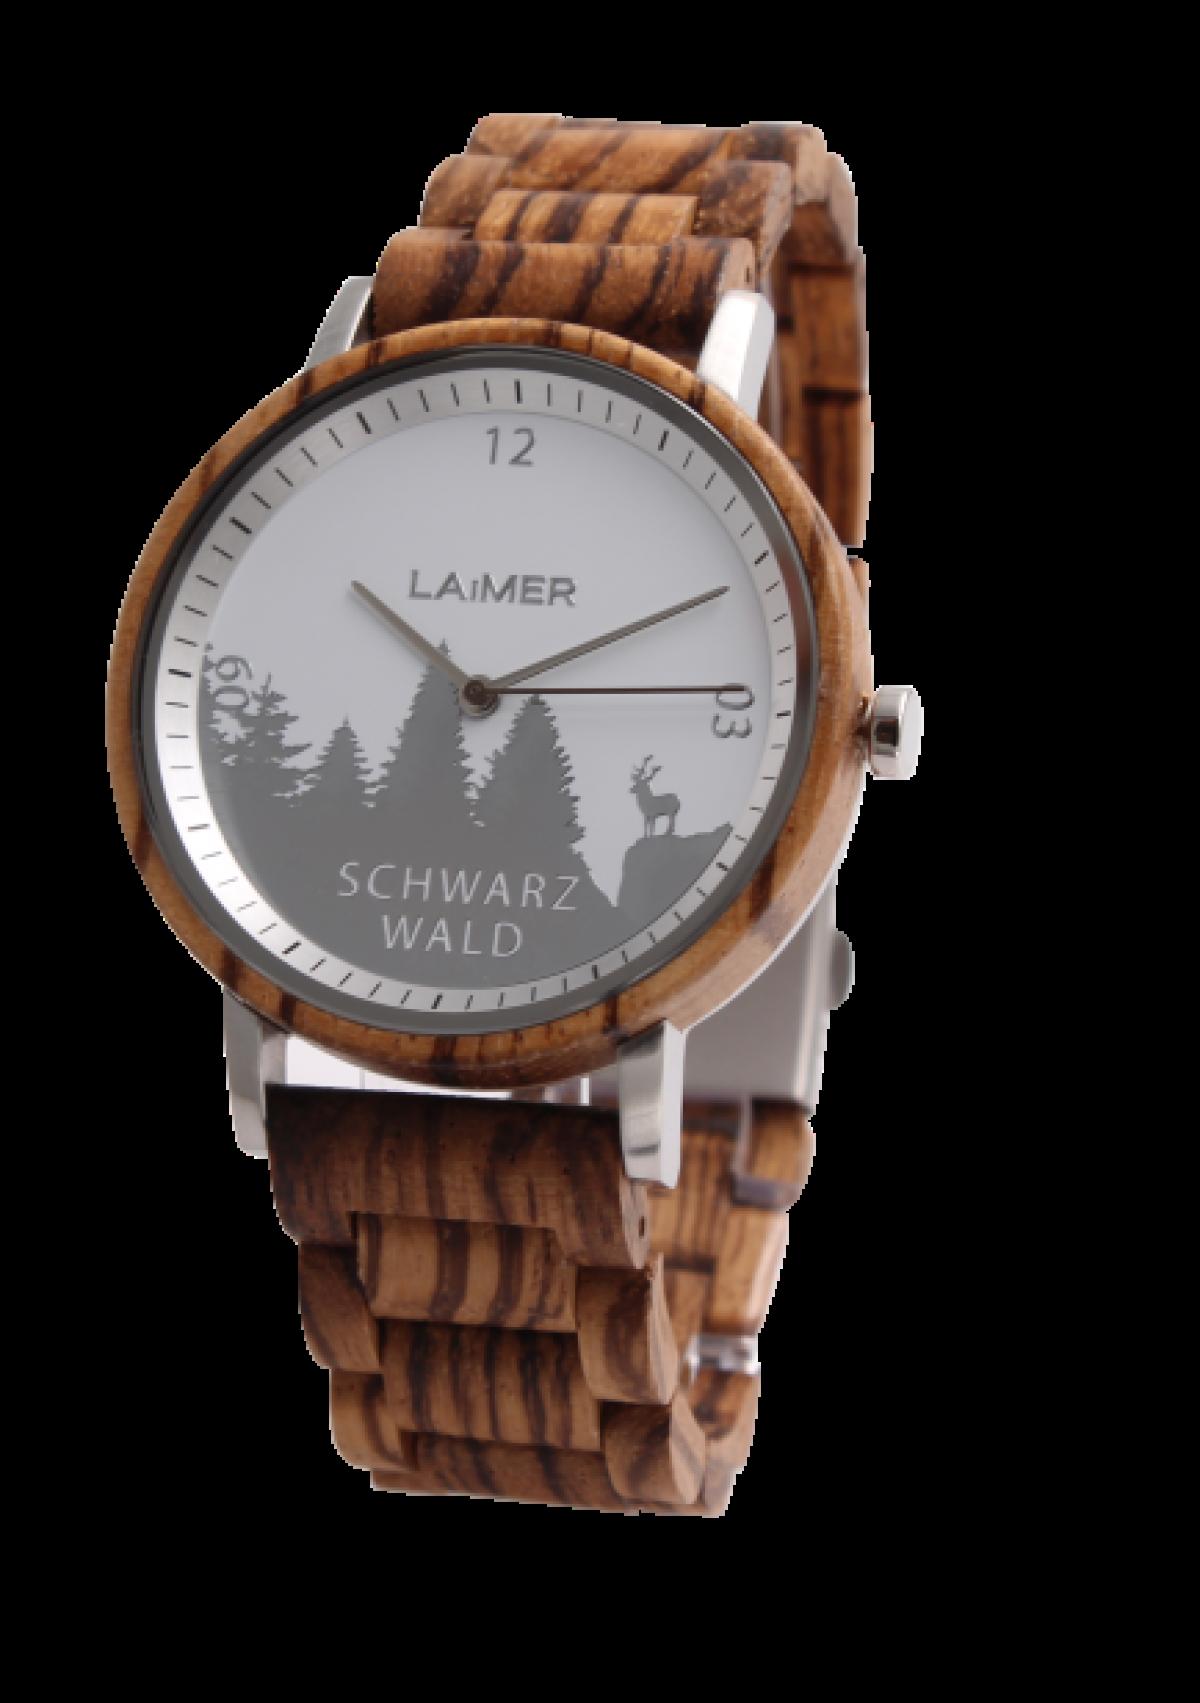 Schwarzwald Laimer Woodwatch Damen | Zebrano hell